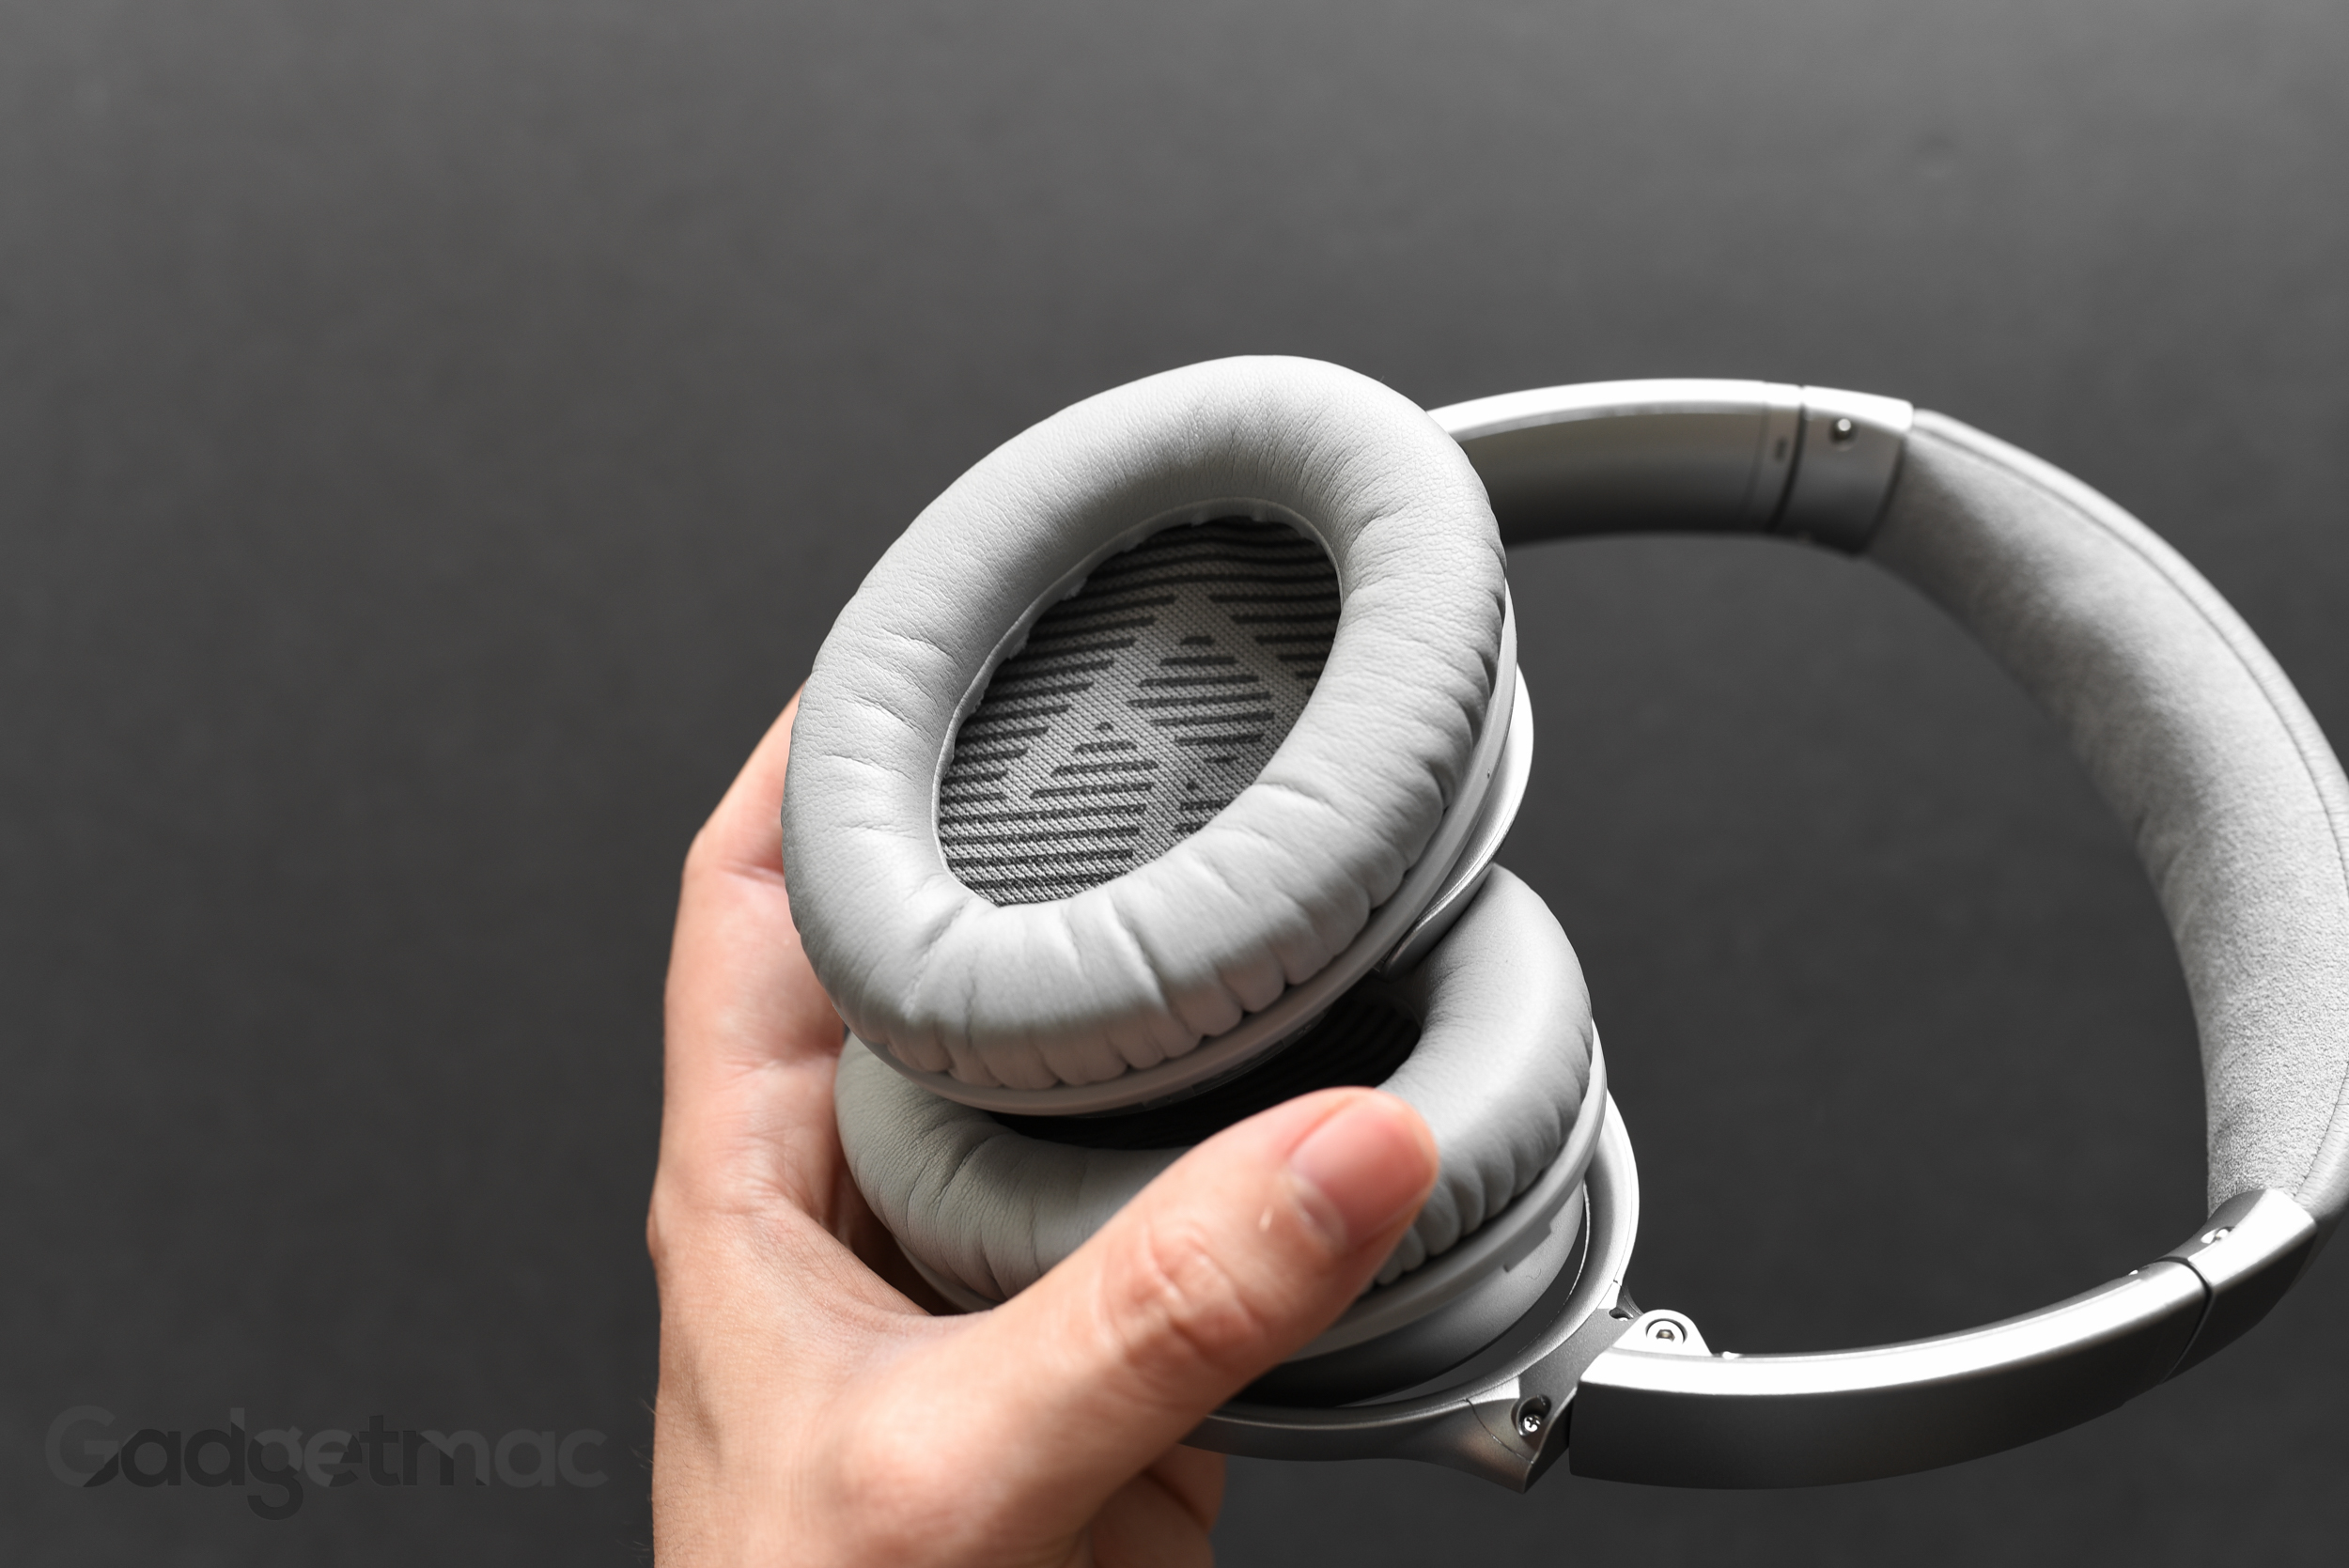 bose-quietcomfort-35-wireless-headphones-padding.jpg